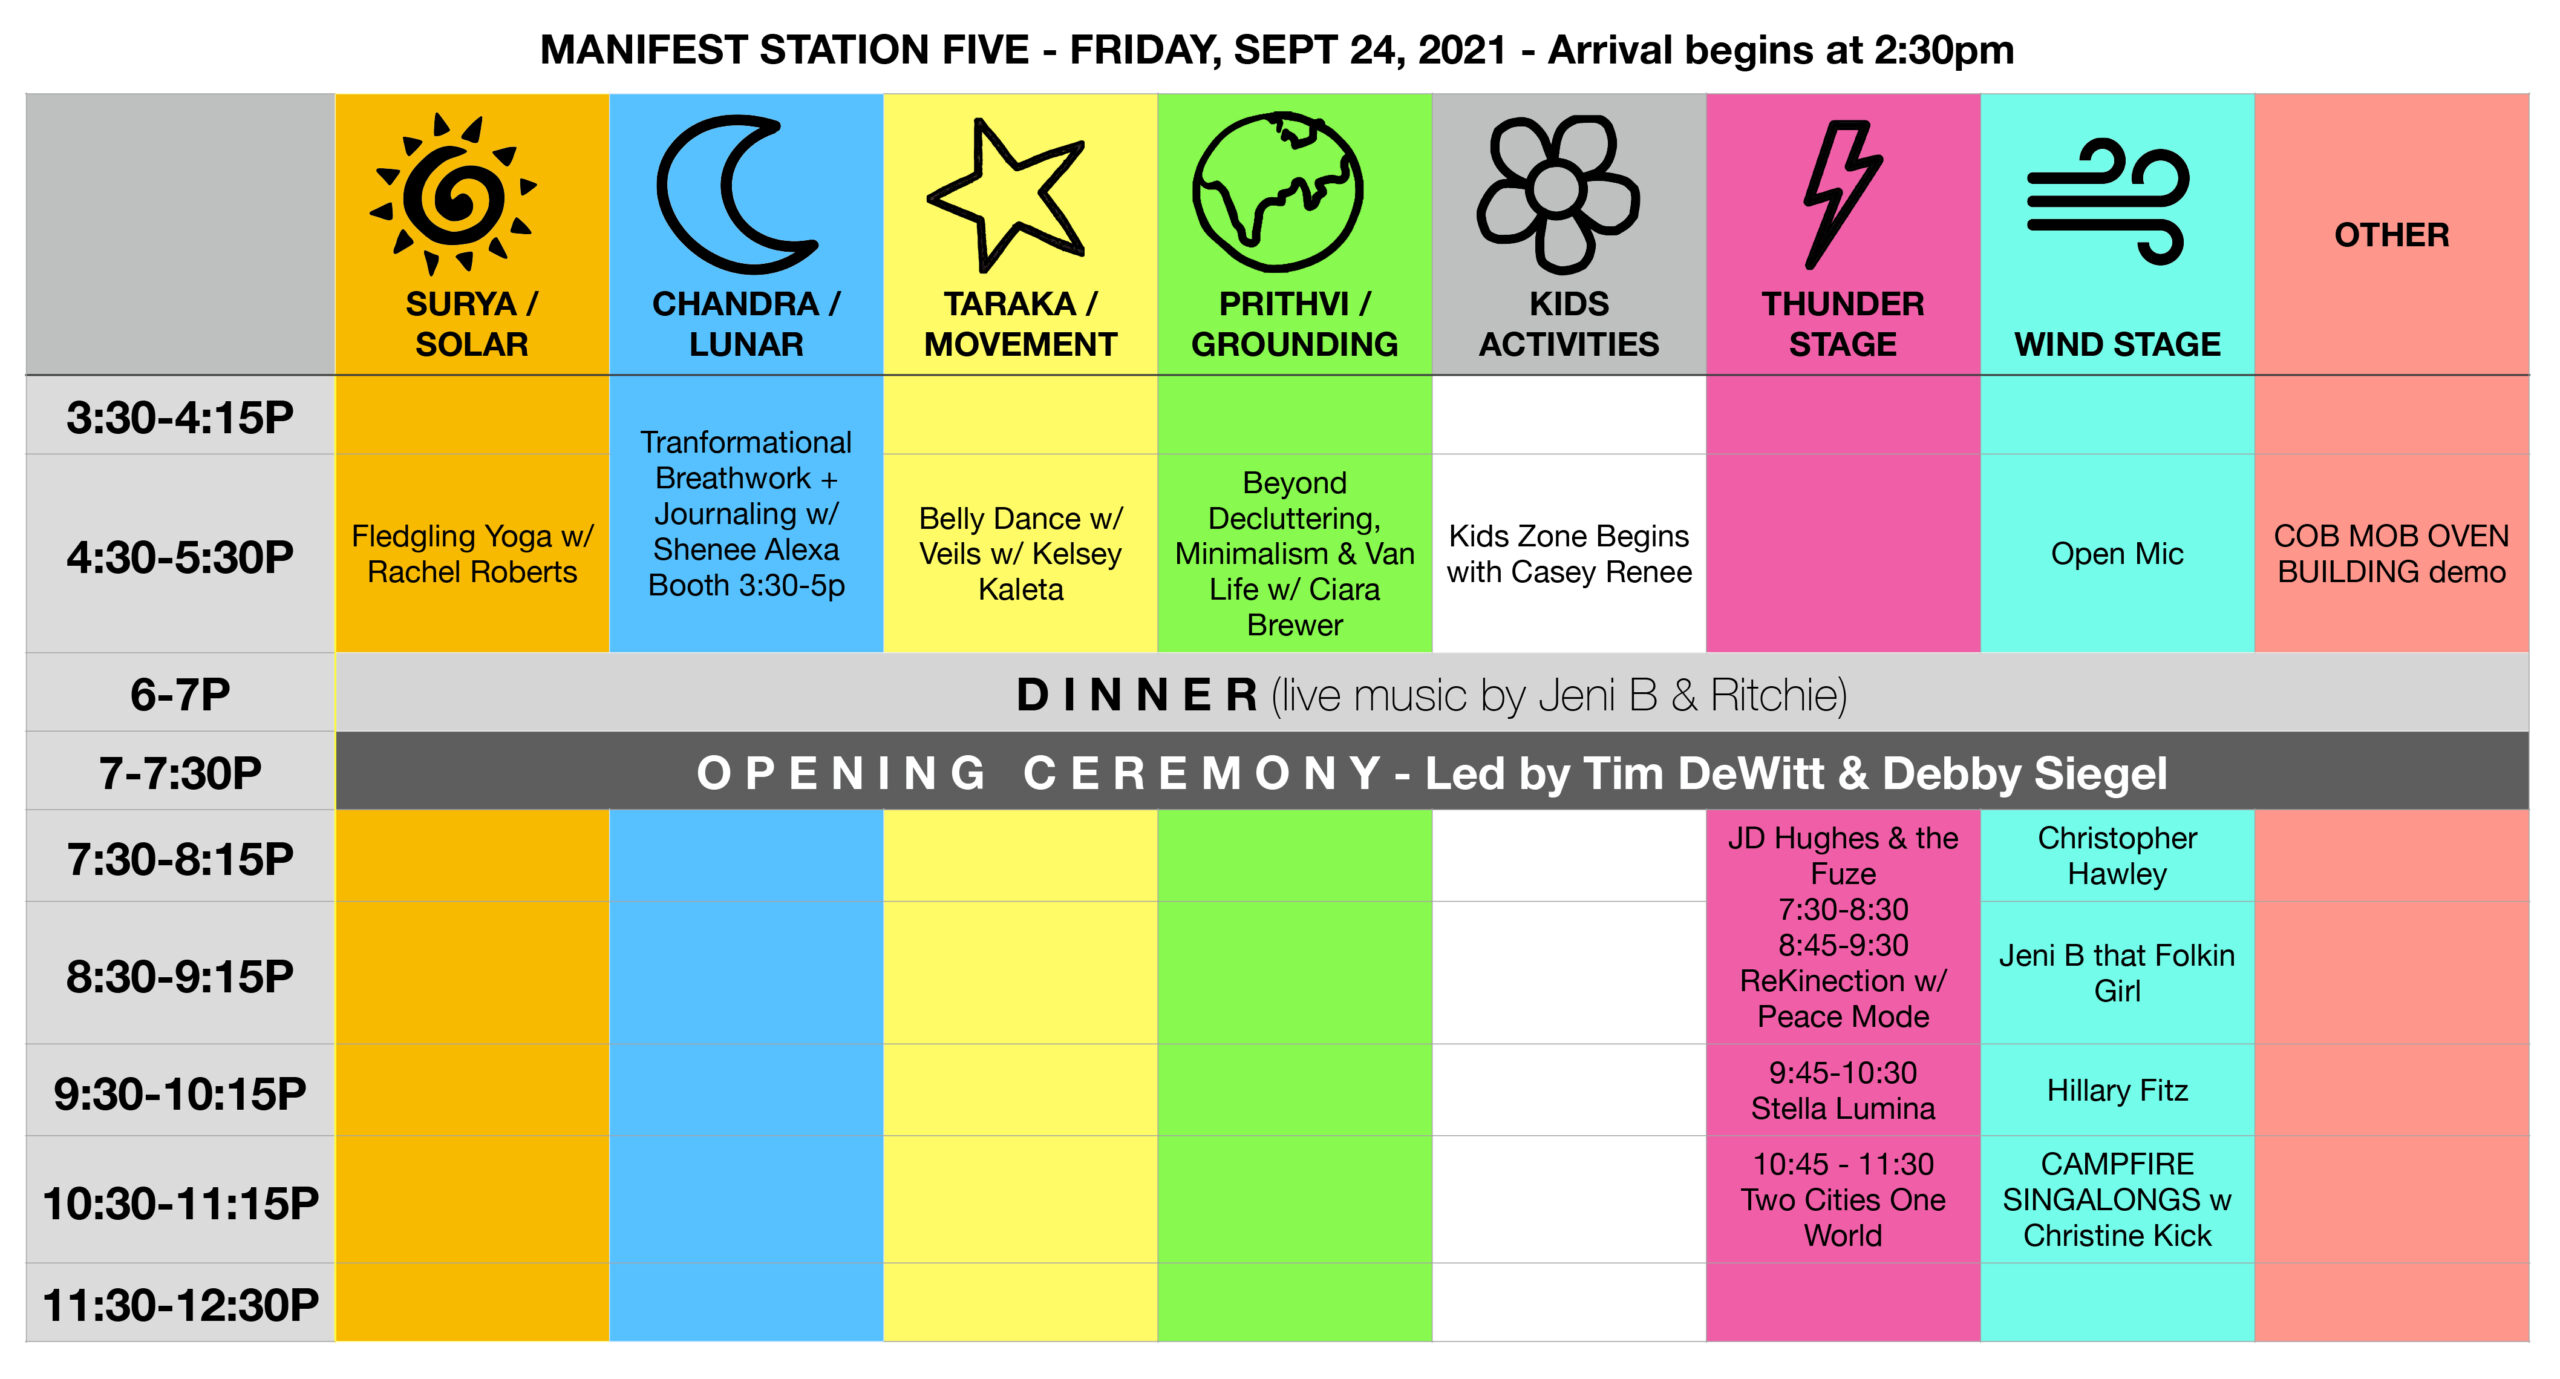 Manifest Station Music & Yoga Festival Schedule Friday, September 24, 2021